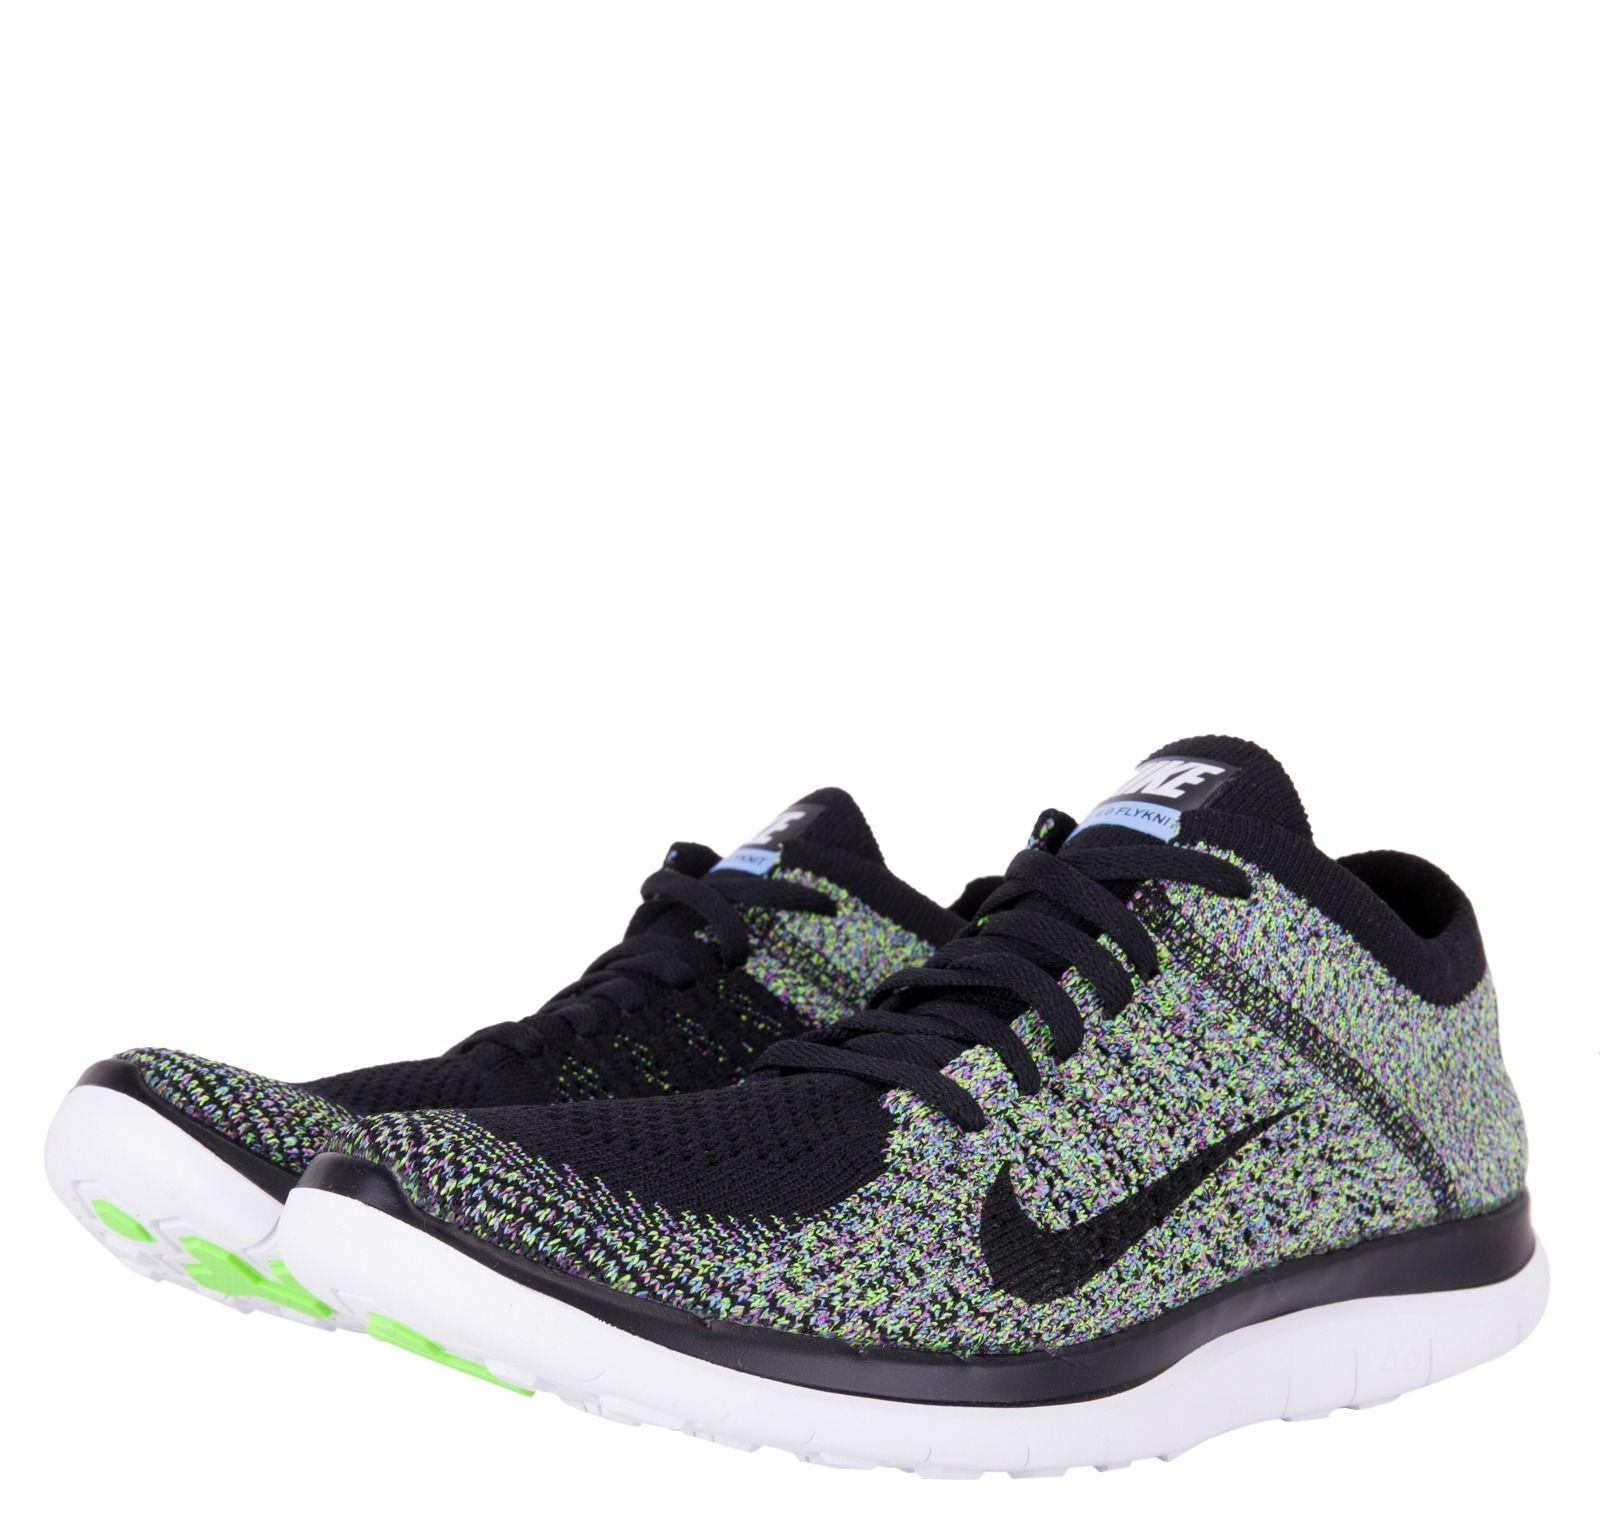 4711d0e08e60 Nike Womens Free 4.0 Flyknit - Black Blue Green - (I so desperately need  new affordable runners!!!)